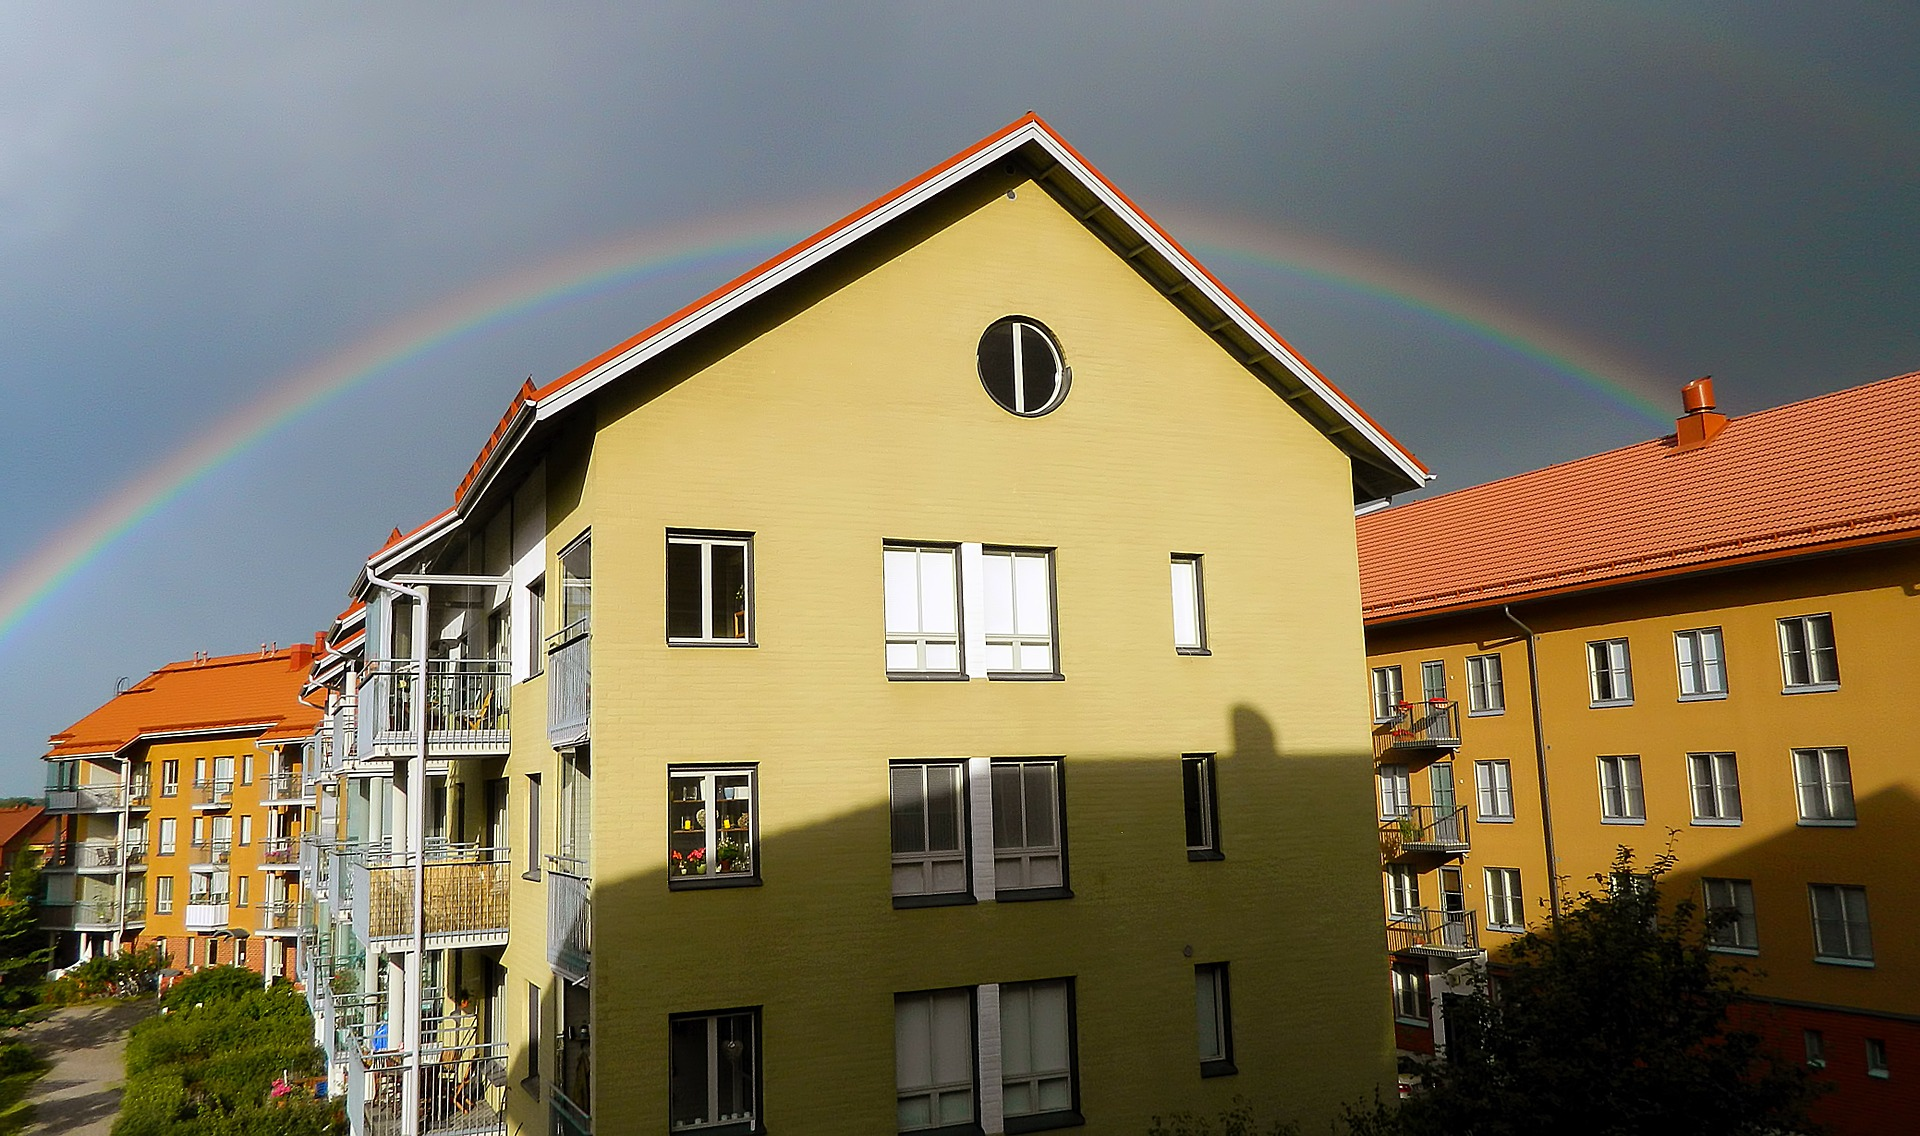 rainbow-235735_1920